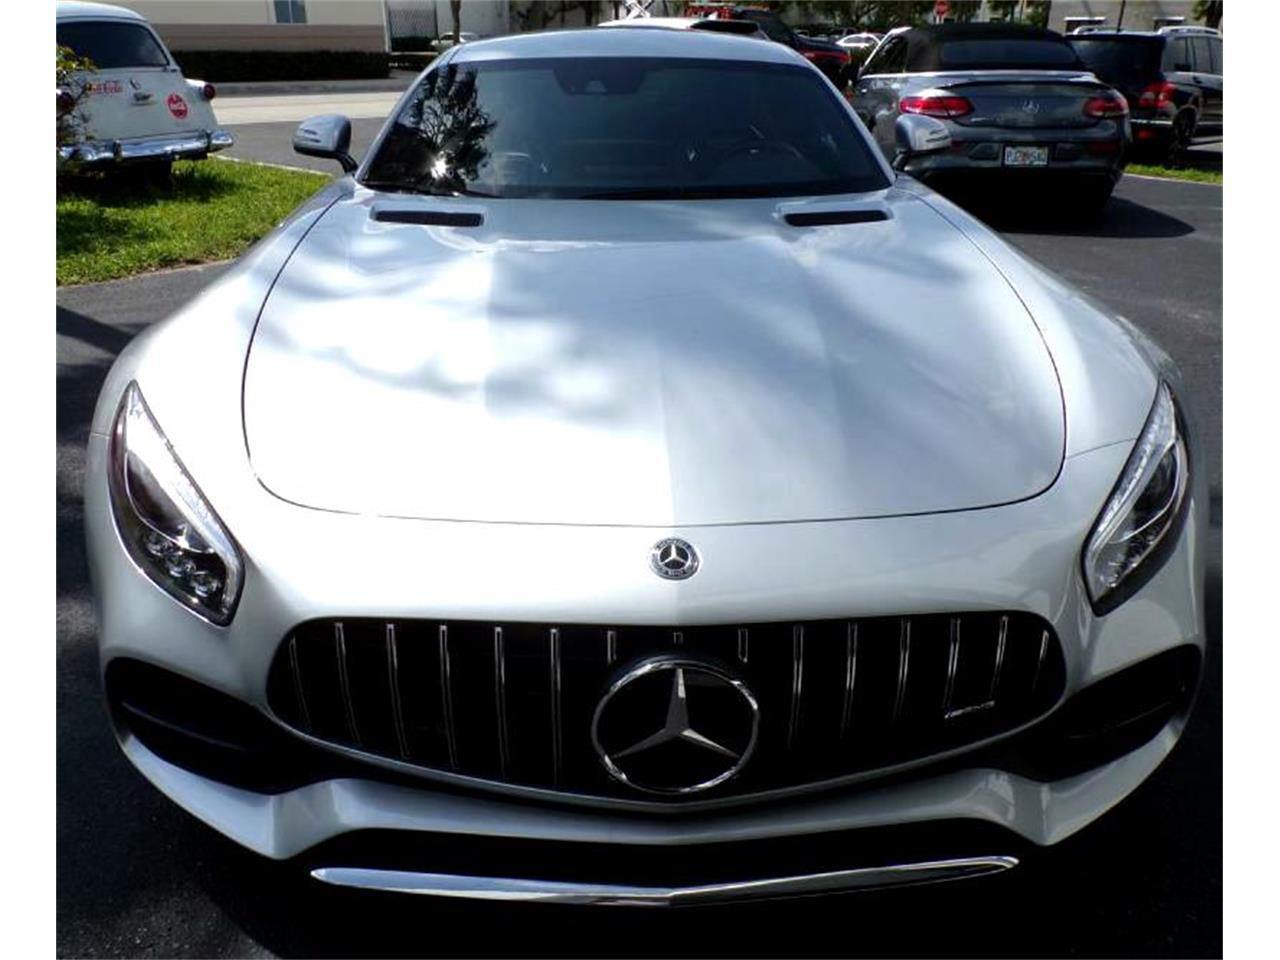 2018 Mercedes-Benz AMG (CC-1354538) for sale in Boca Raton, Florida